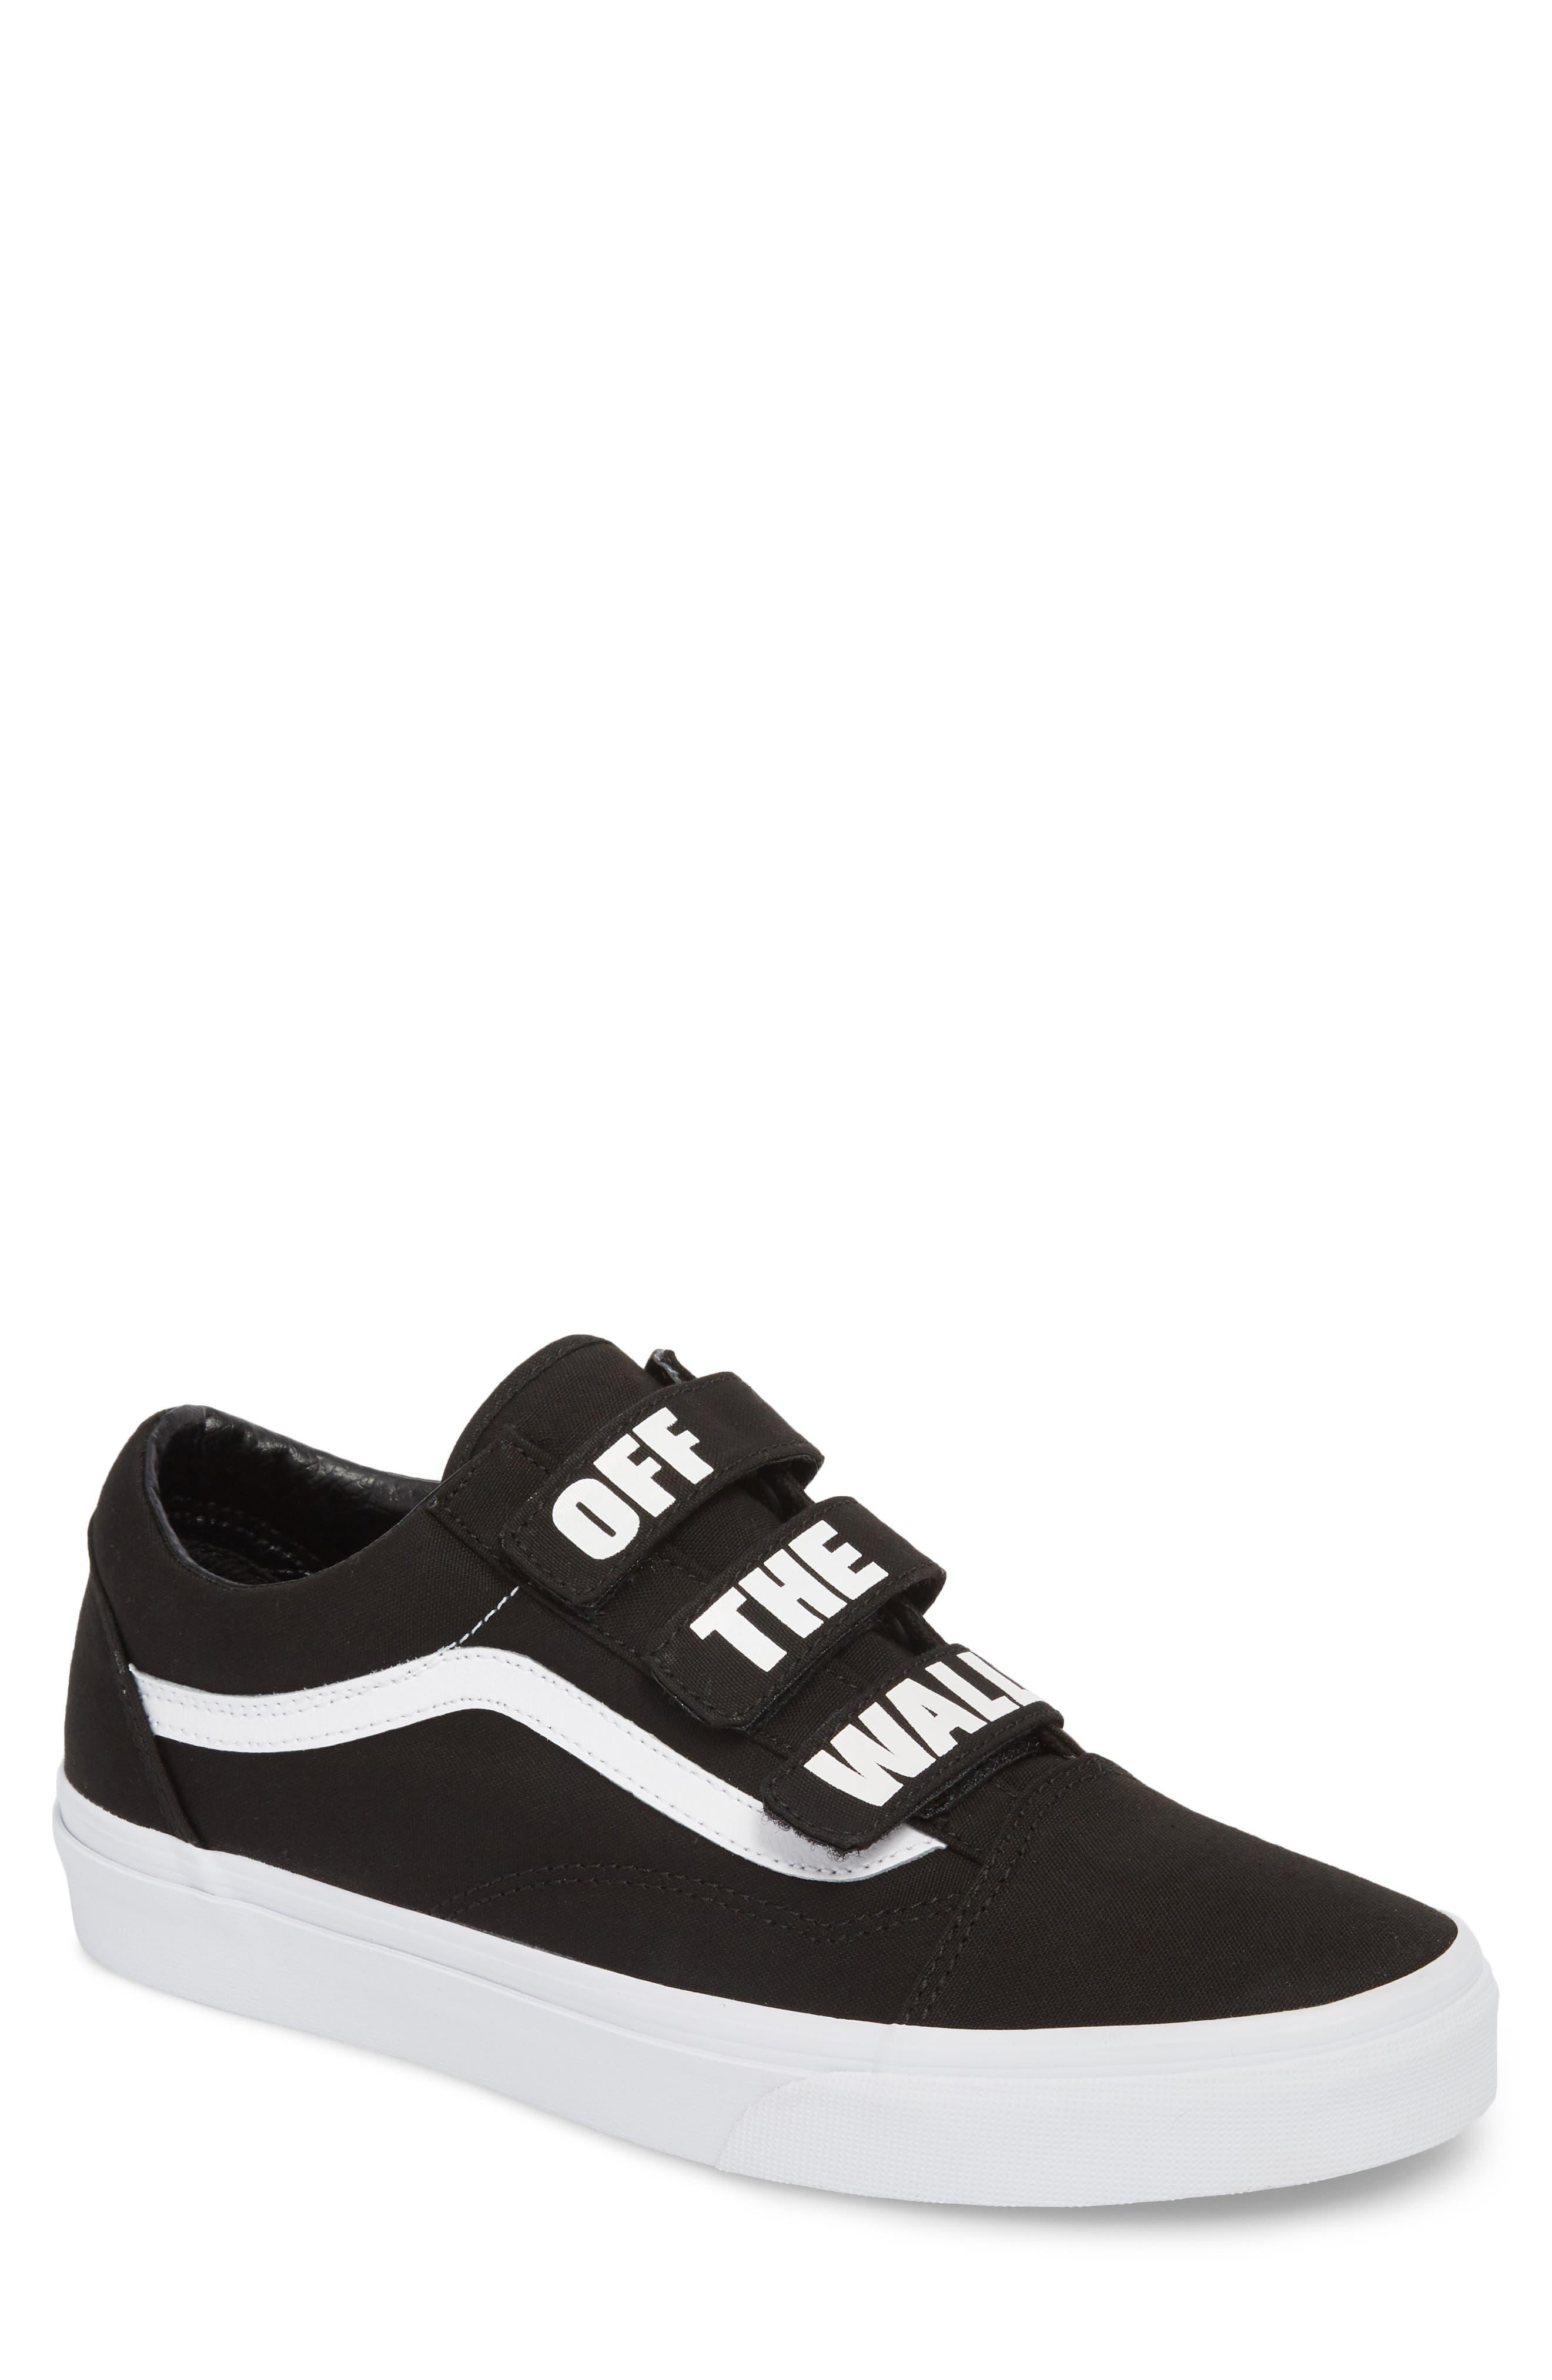 Off the Wall Old Skool V Sneaker,                             Main thumbnail 1, color,                             Black/ True White